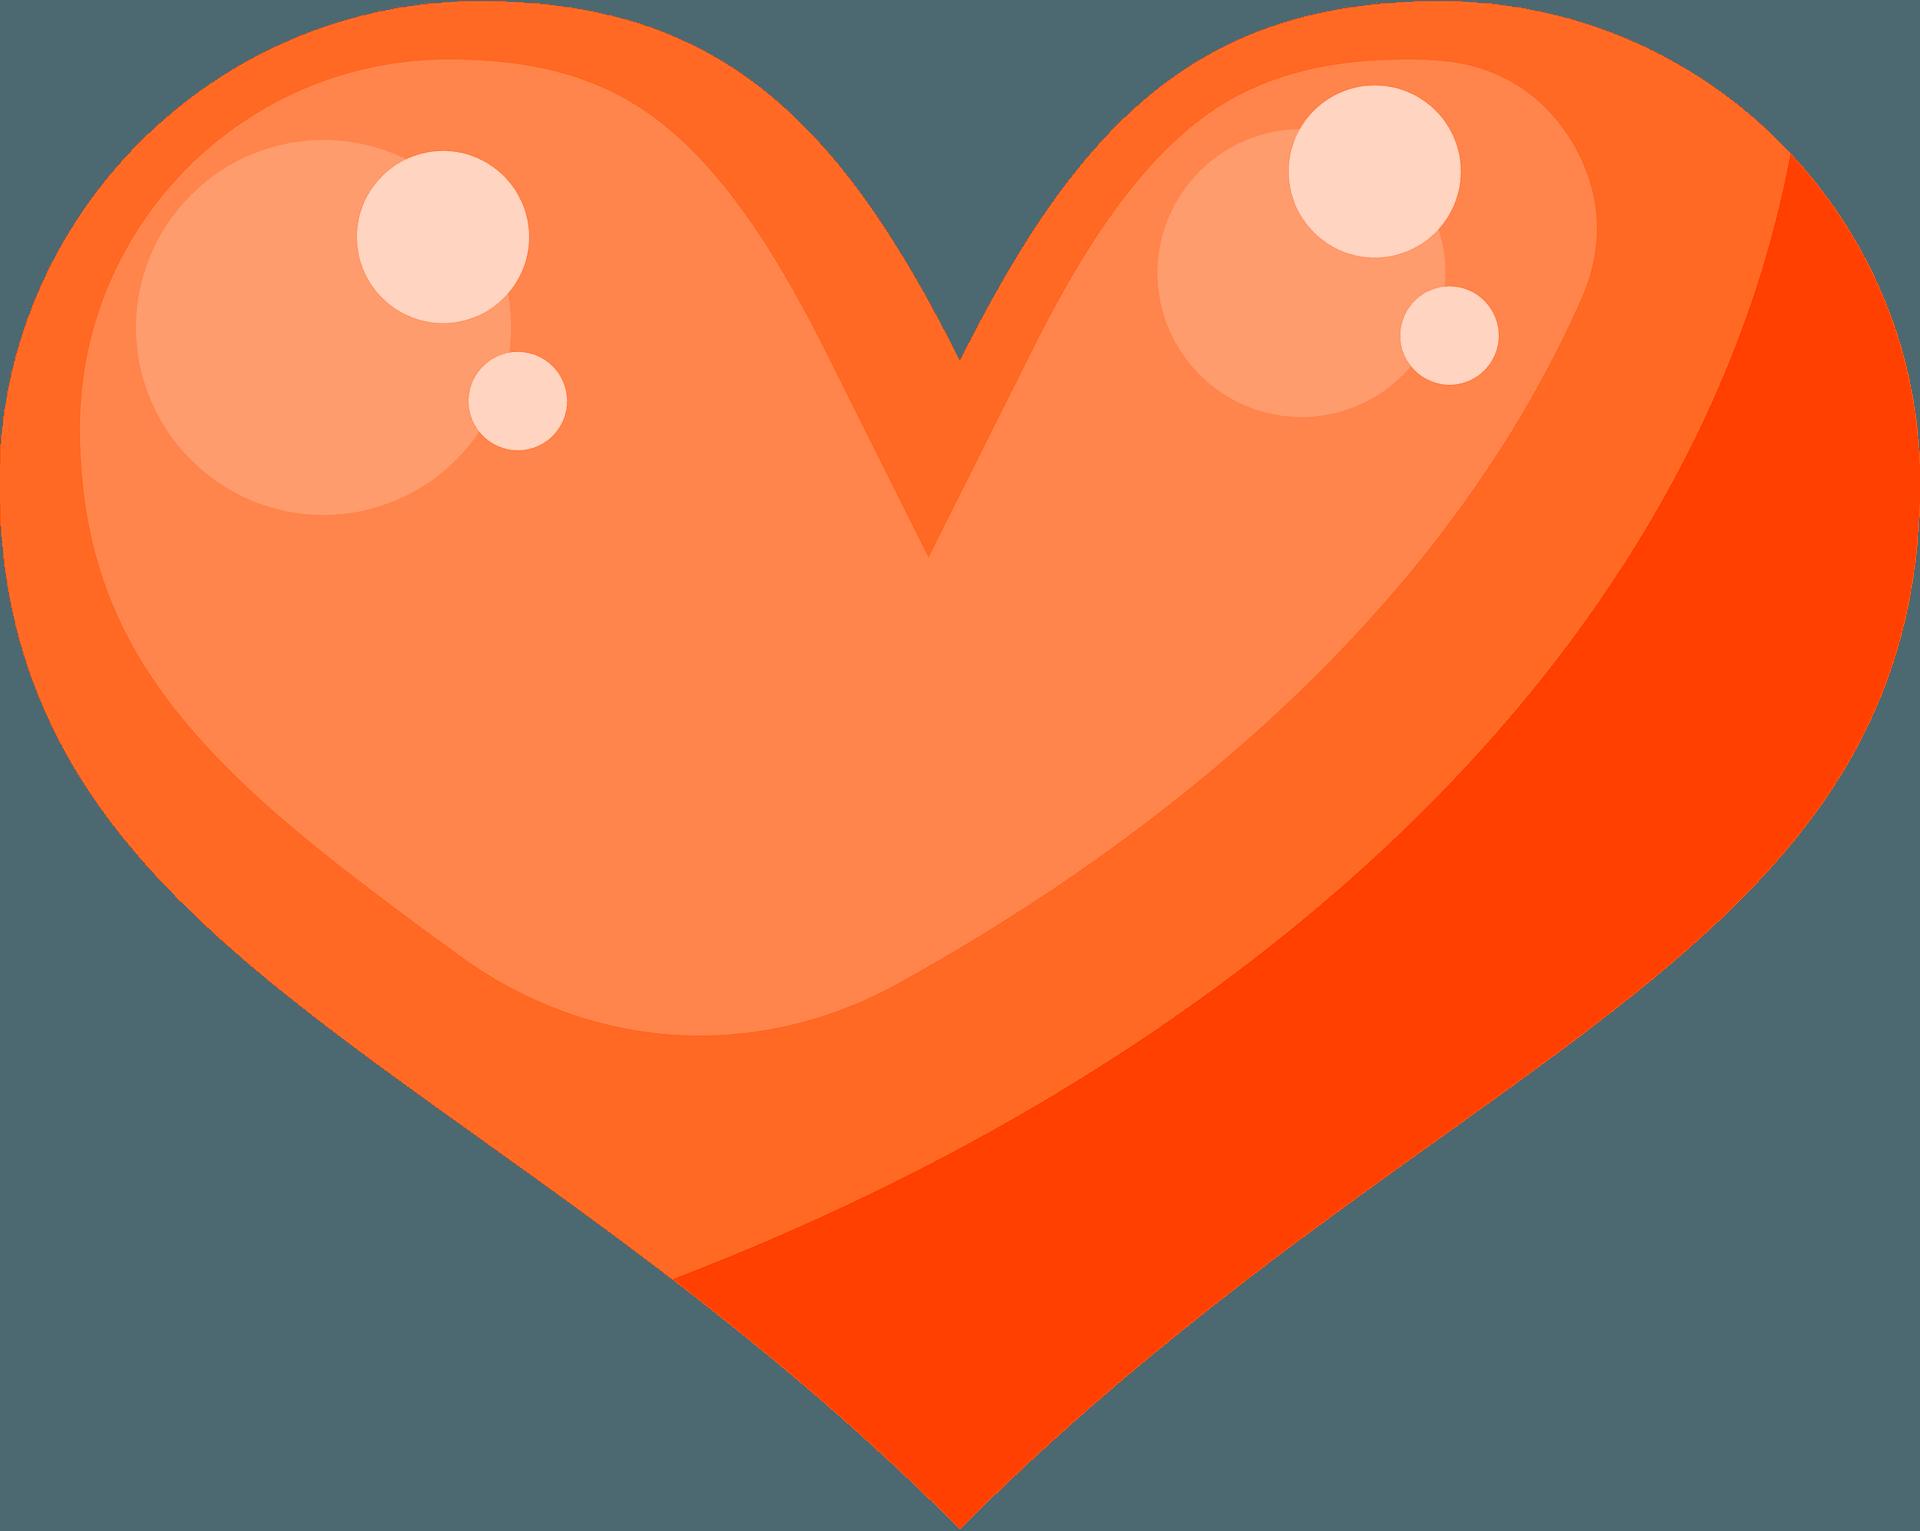 Love Symbols Stock Illustrations – 54,029 Love Symbols Stock Illustrations,  Vectors & Clipart - Dreamstime